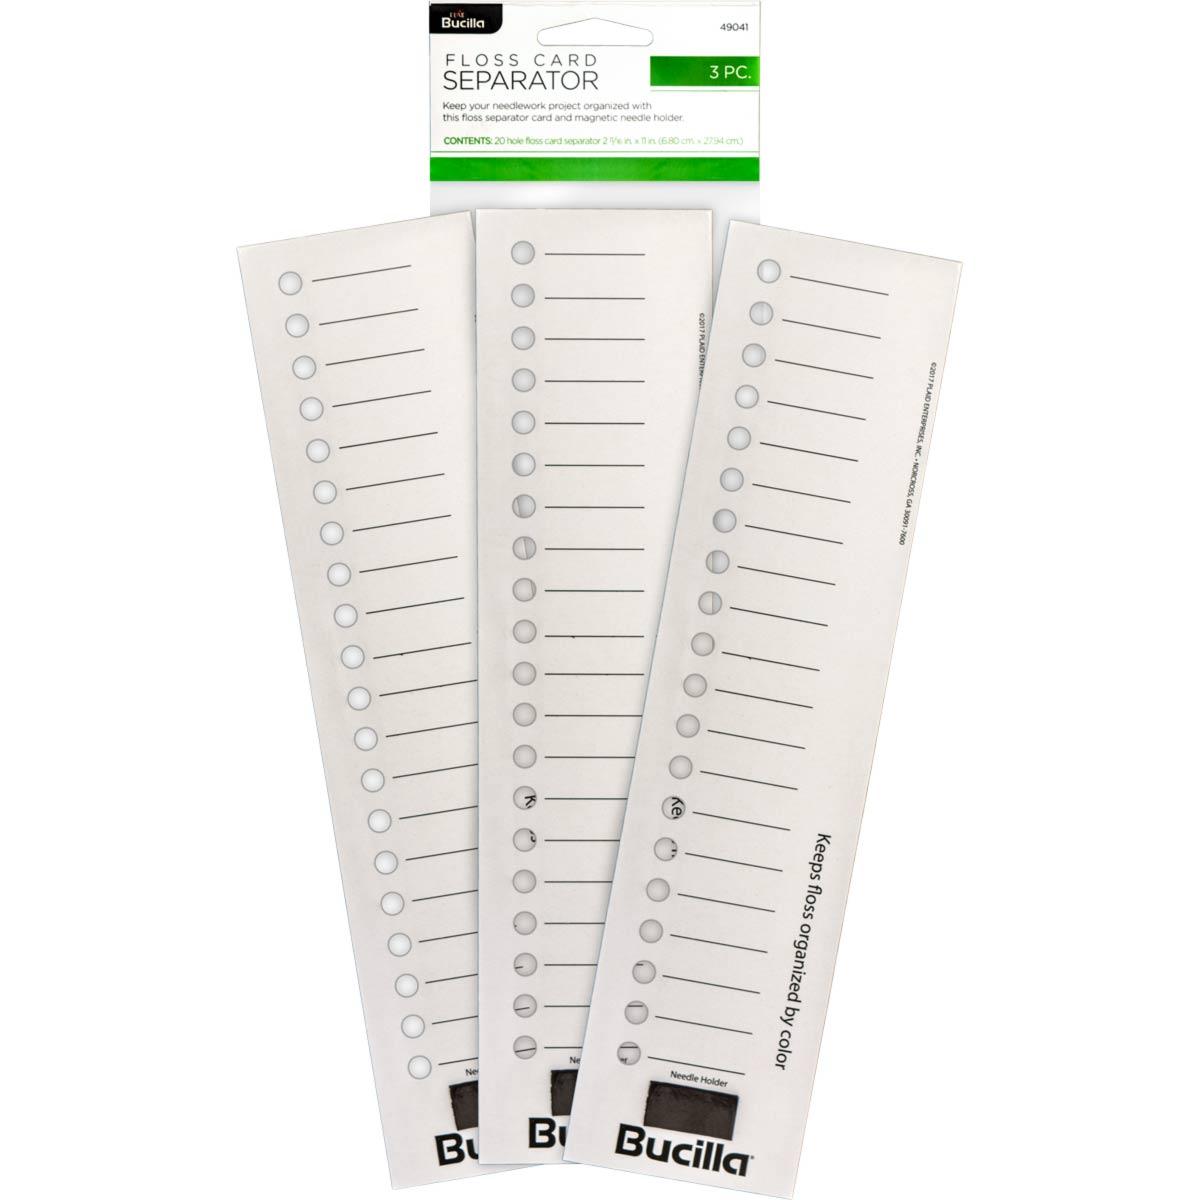 Bucilla ® Floss Separator - Small, 3 piece - 49041